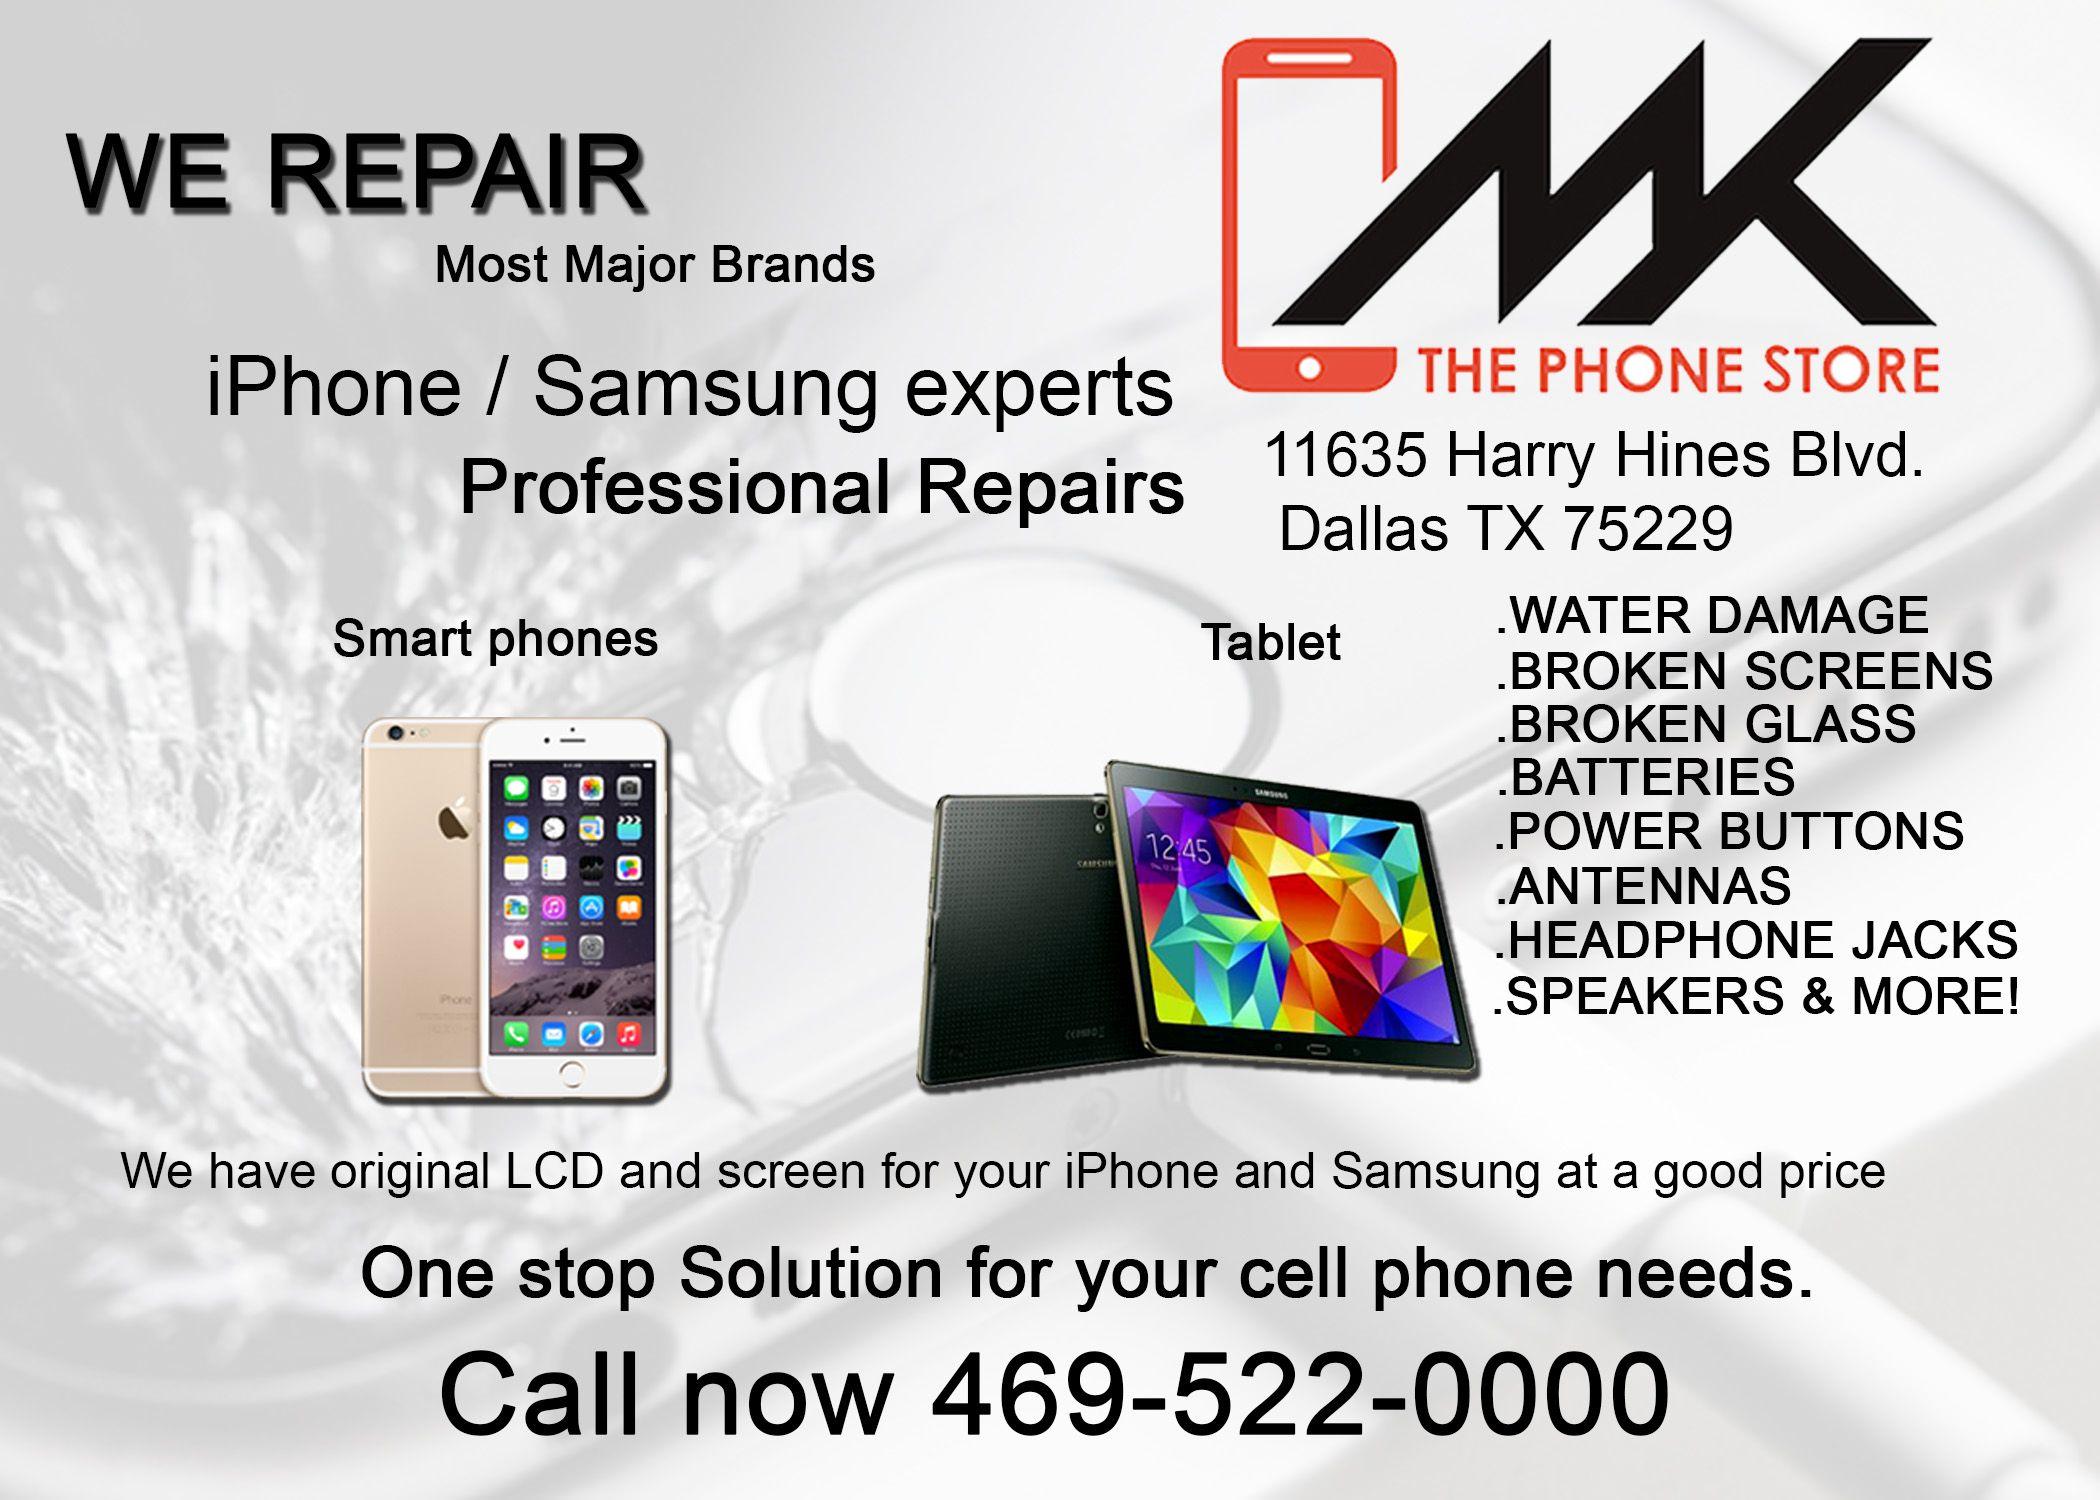 Pin by ashlin on repairs phone store broken